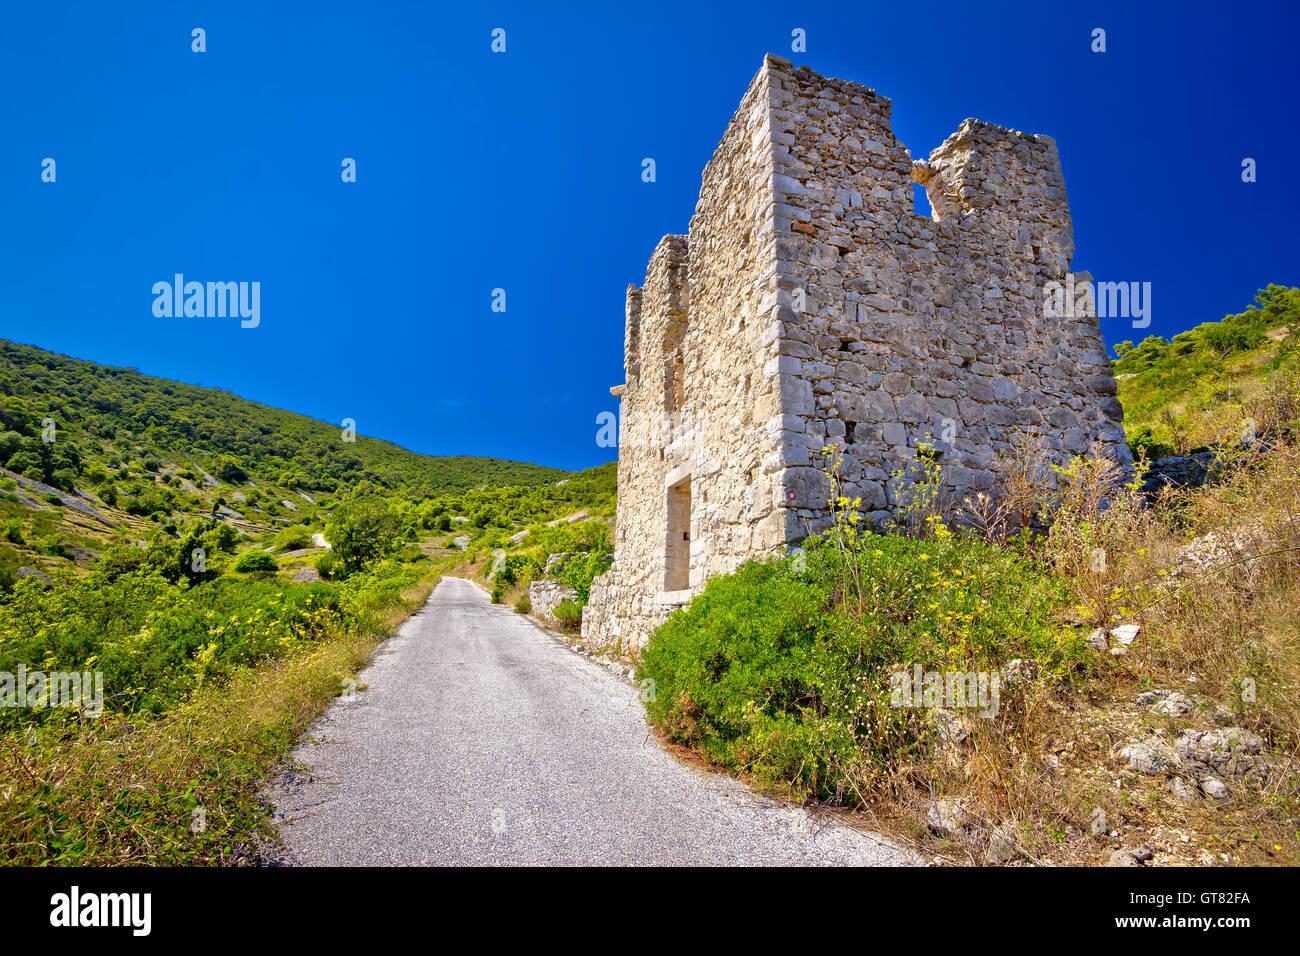 Island Vis military zone old guard tower ruin, Dalmatia, Croatia Stock Photo